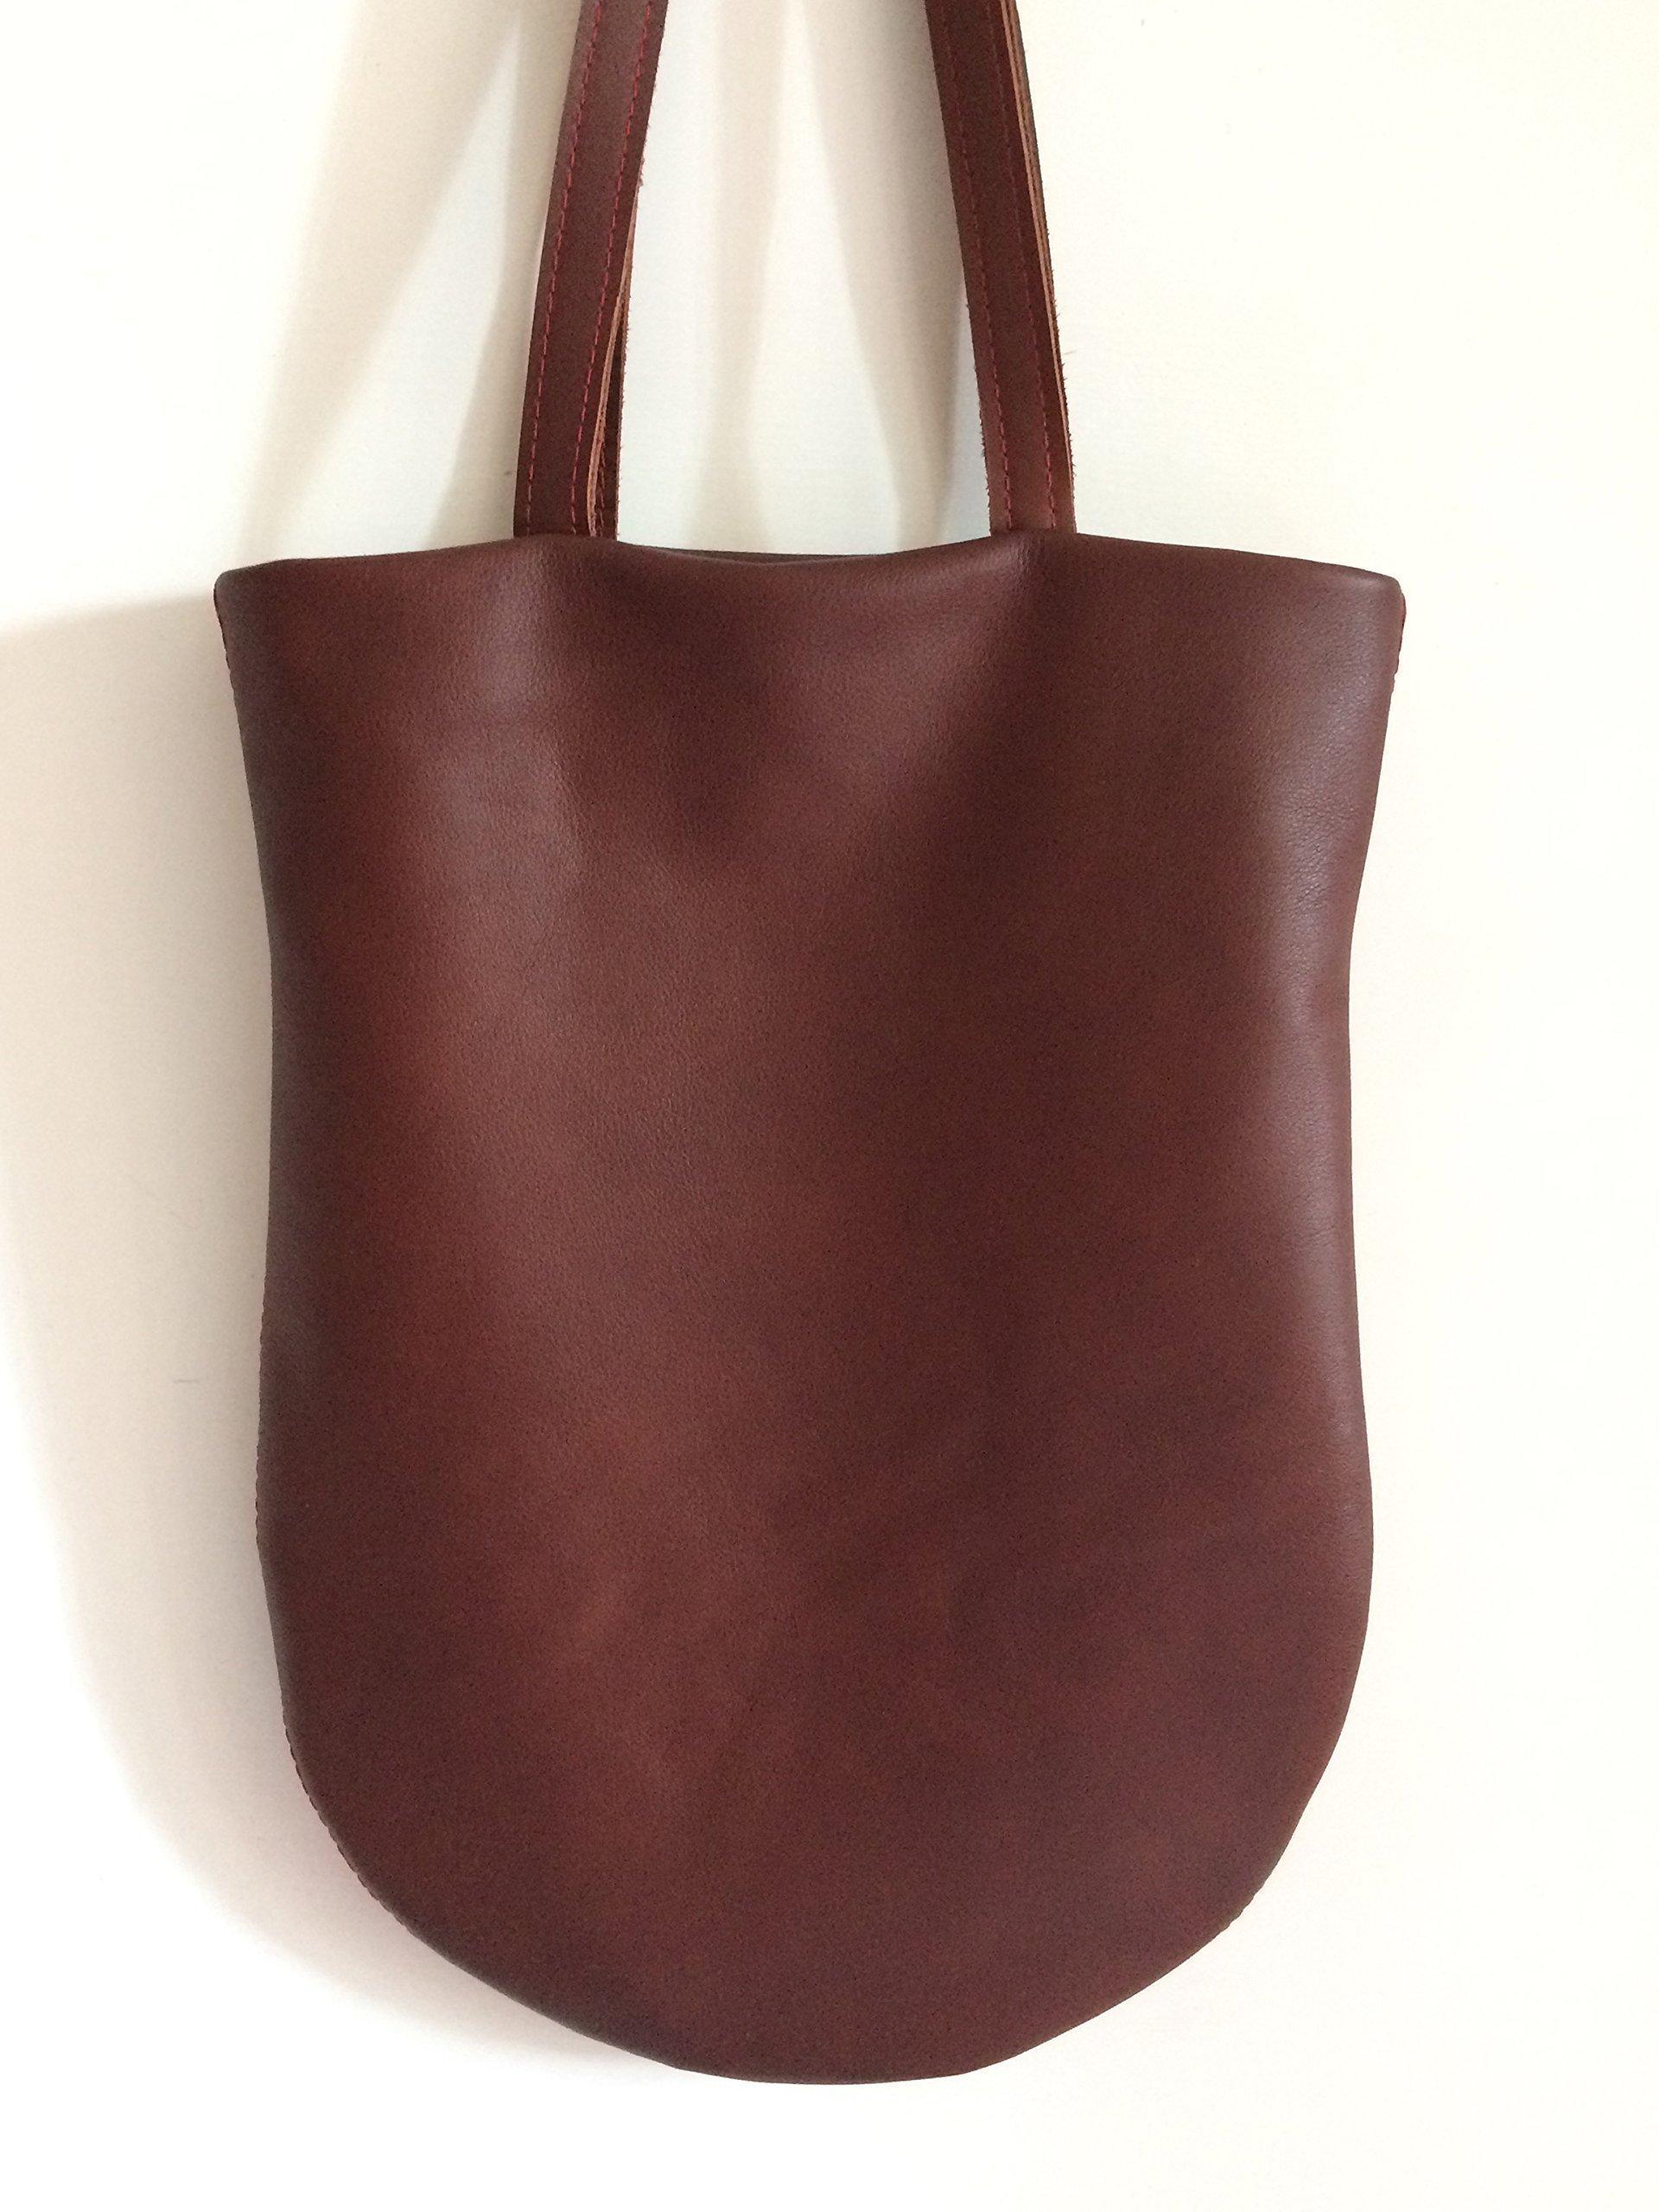 Leather brown tote bag, briefcases for woman, work bag or elegant bag, handmade handbags limited edition BBagdesign. - handmade-bags